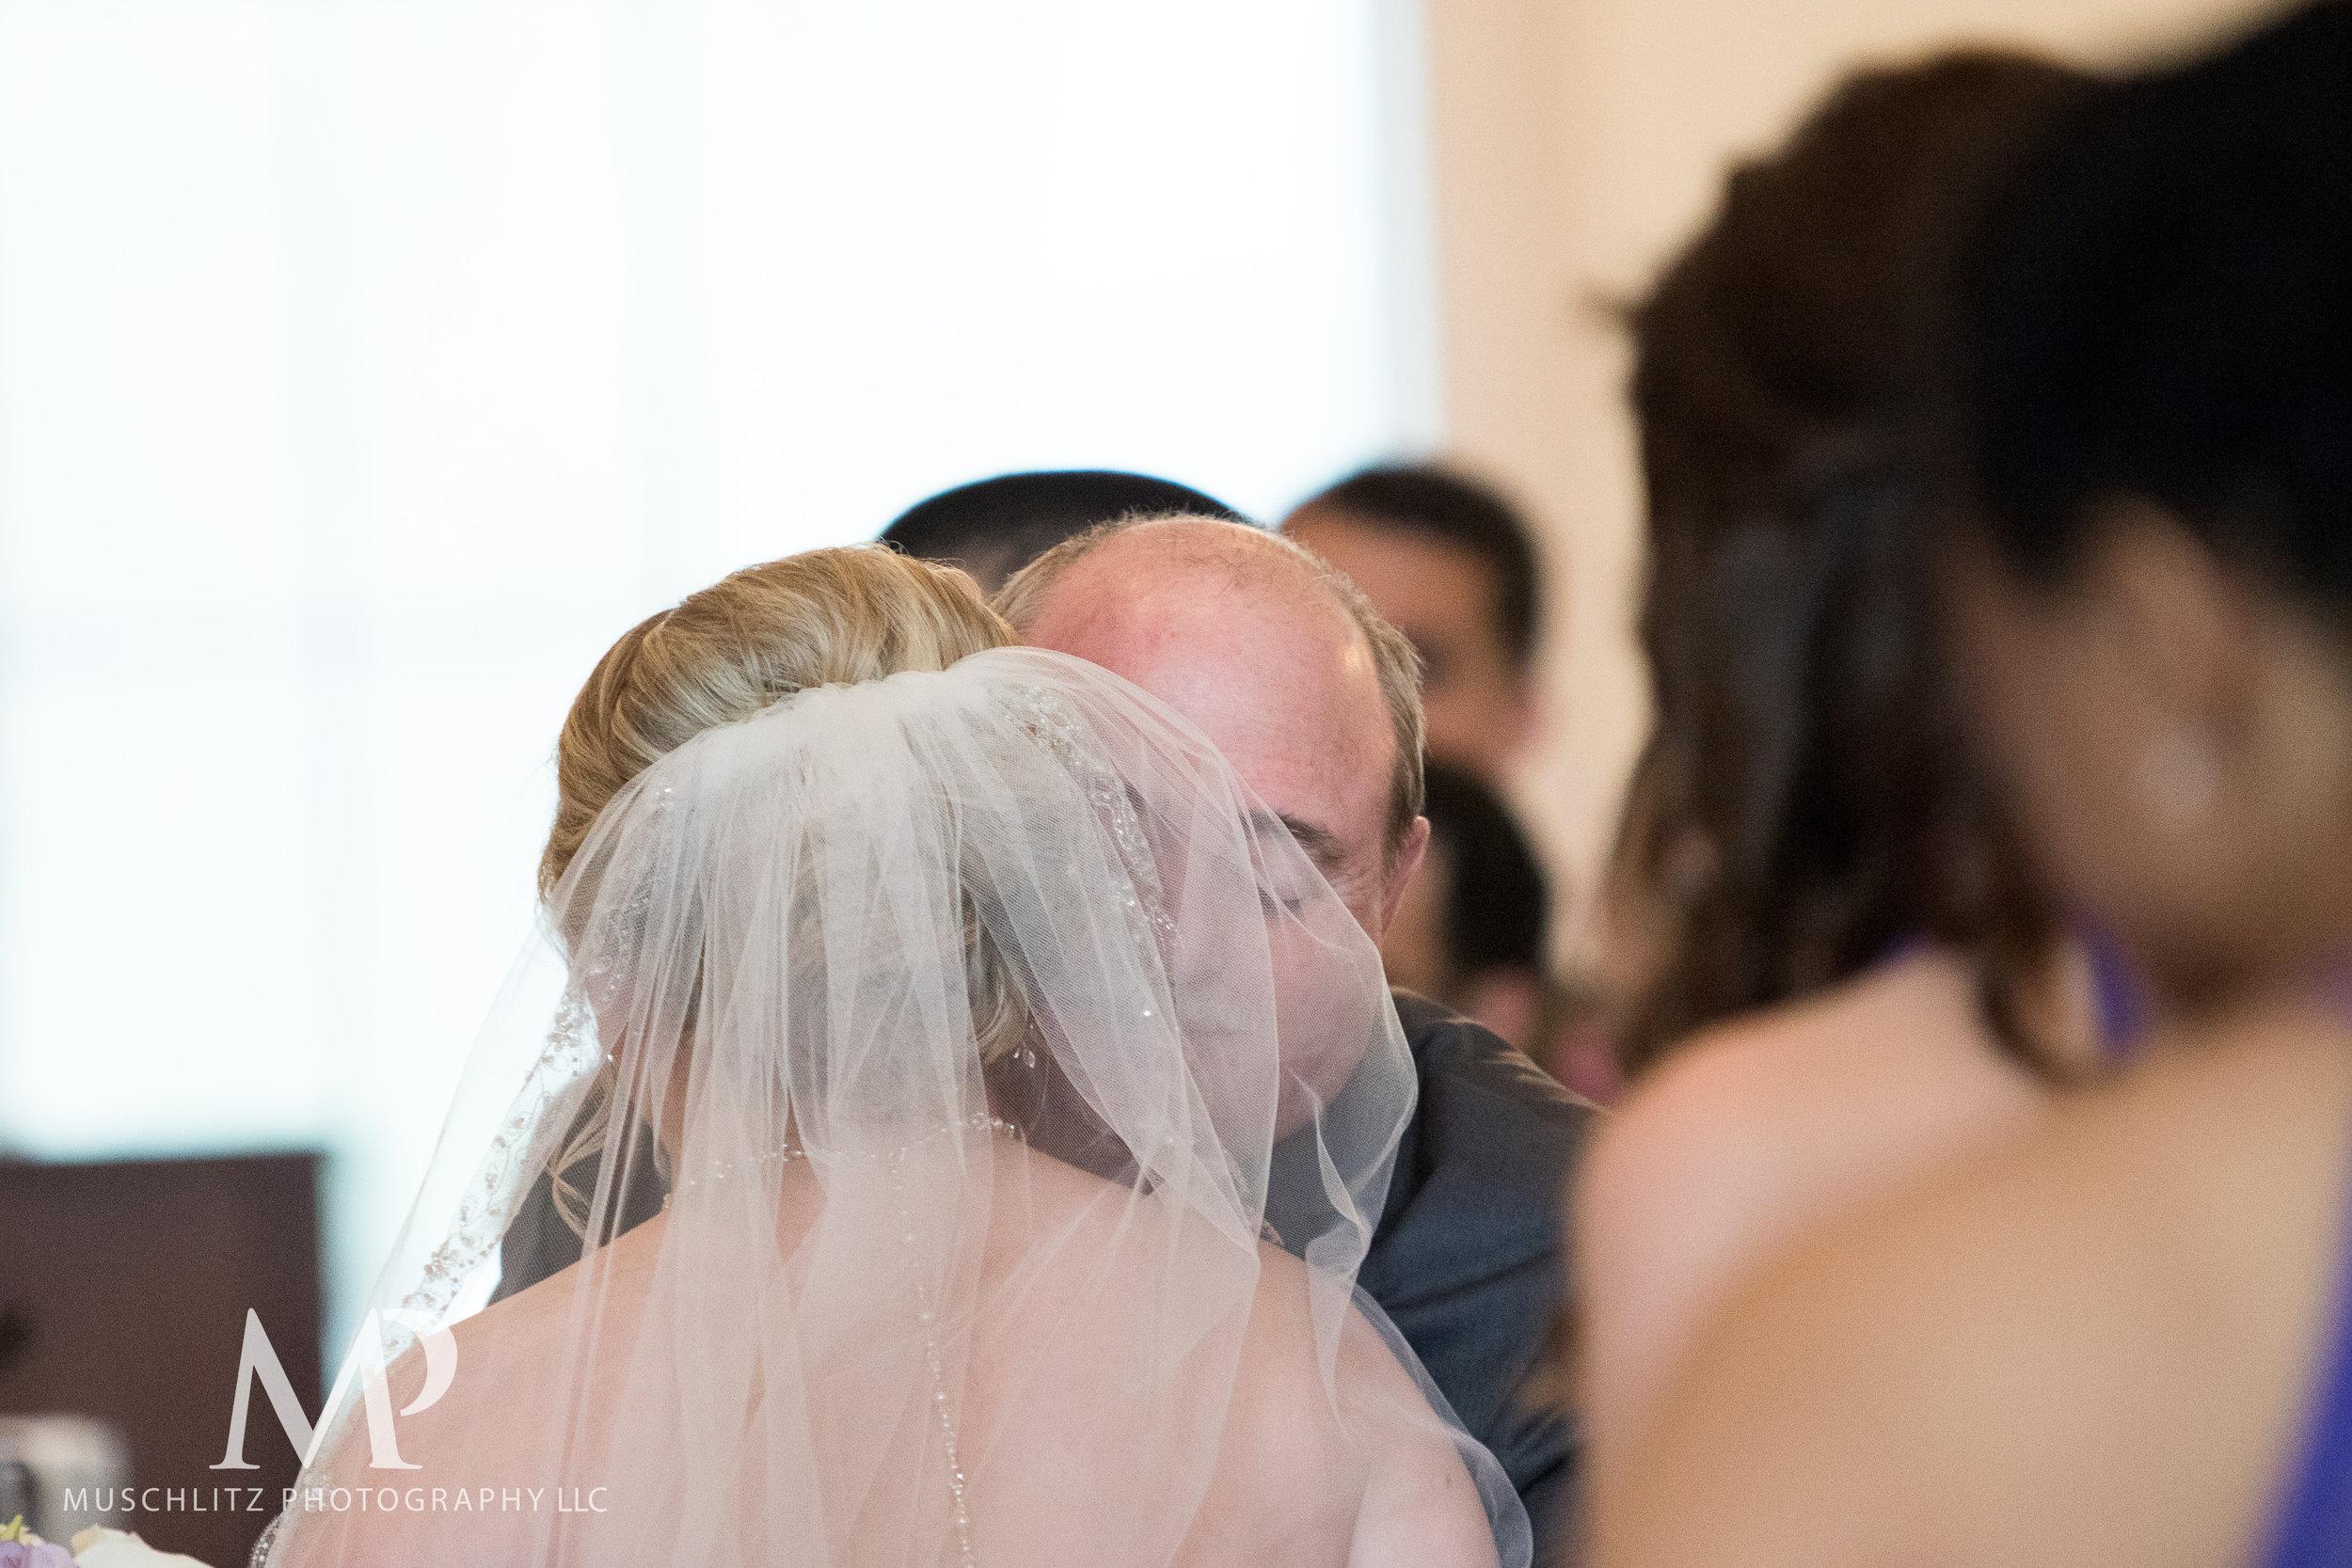 dublin-community-church-wedding-columbus-ohio-muschlitz-photography-040.JPG